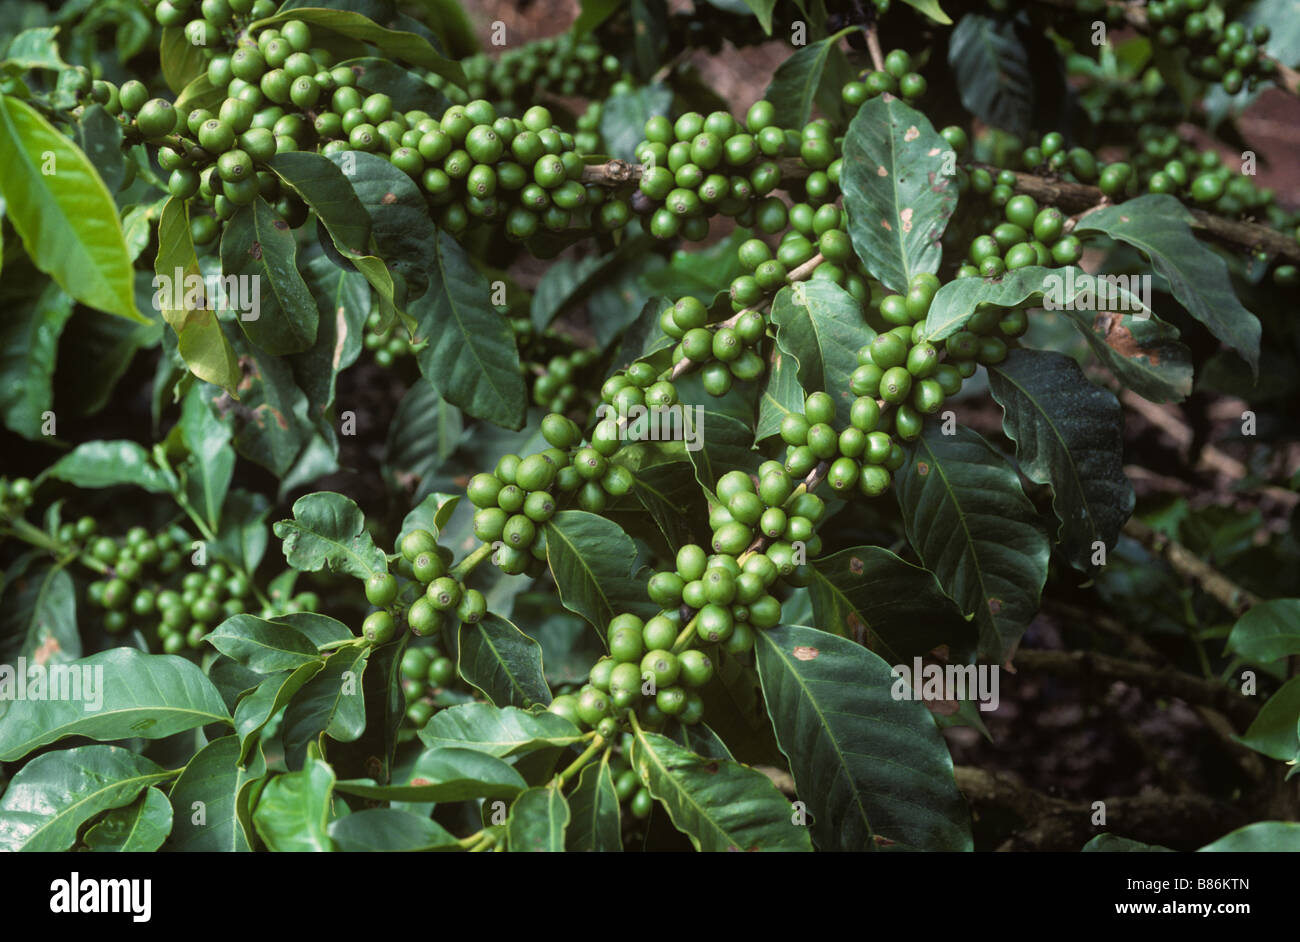 Arabica coffee branches with developing green berries Nairobi Kenya - Stock Image